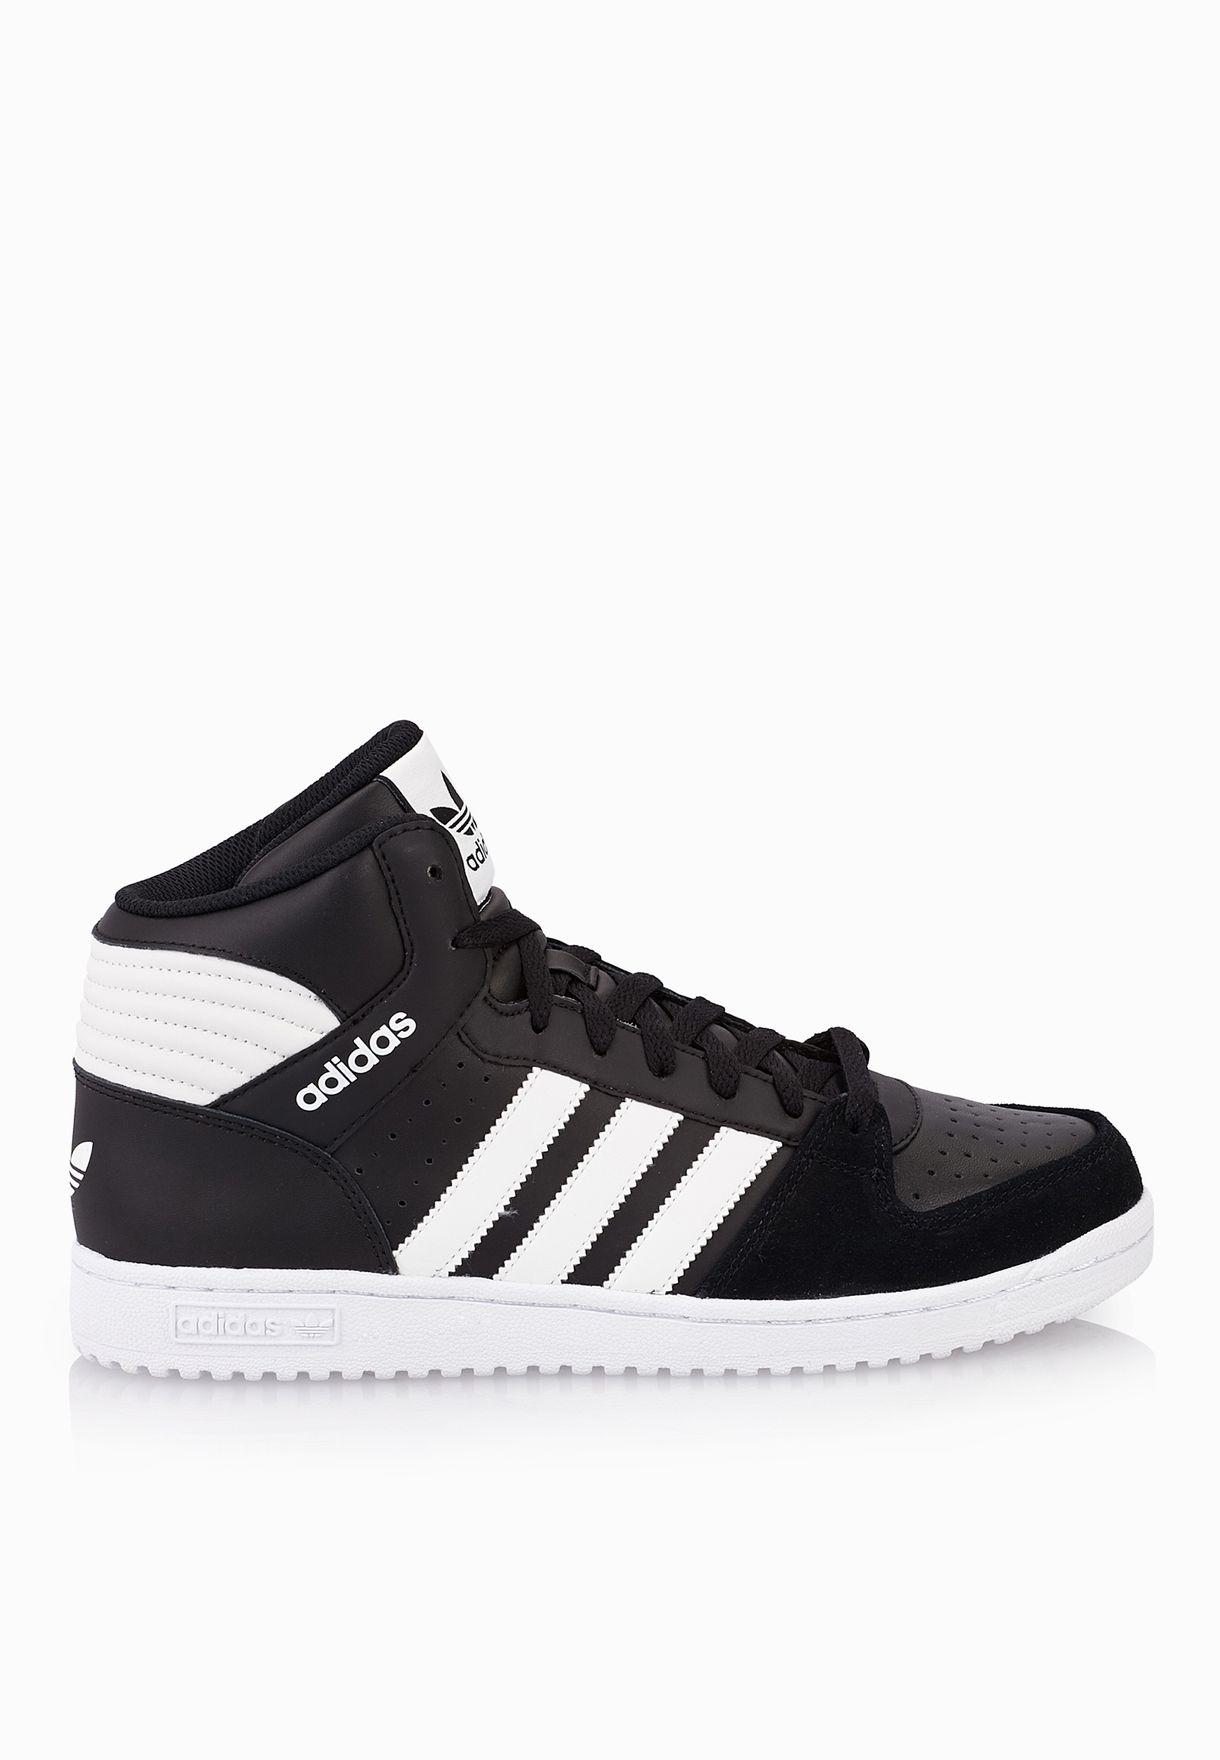 Mens shoes adidas originals pro play 2 ii black white mens